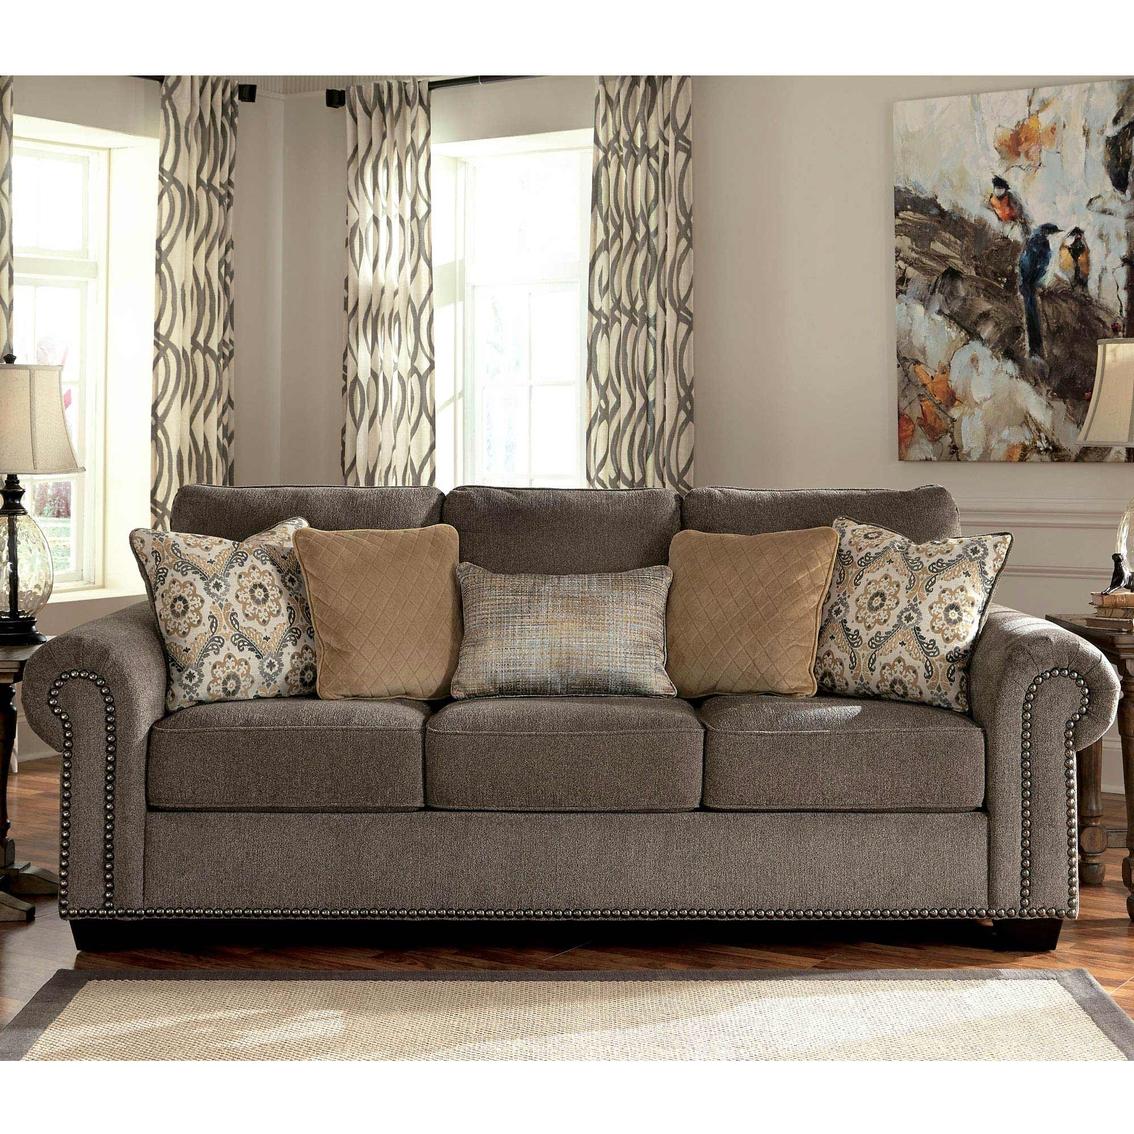 Benchcraft Emelen Sofa